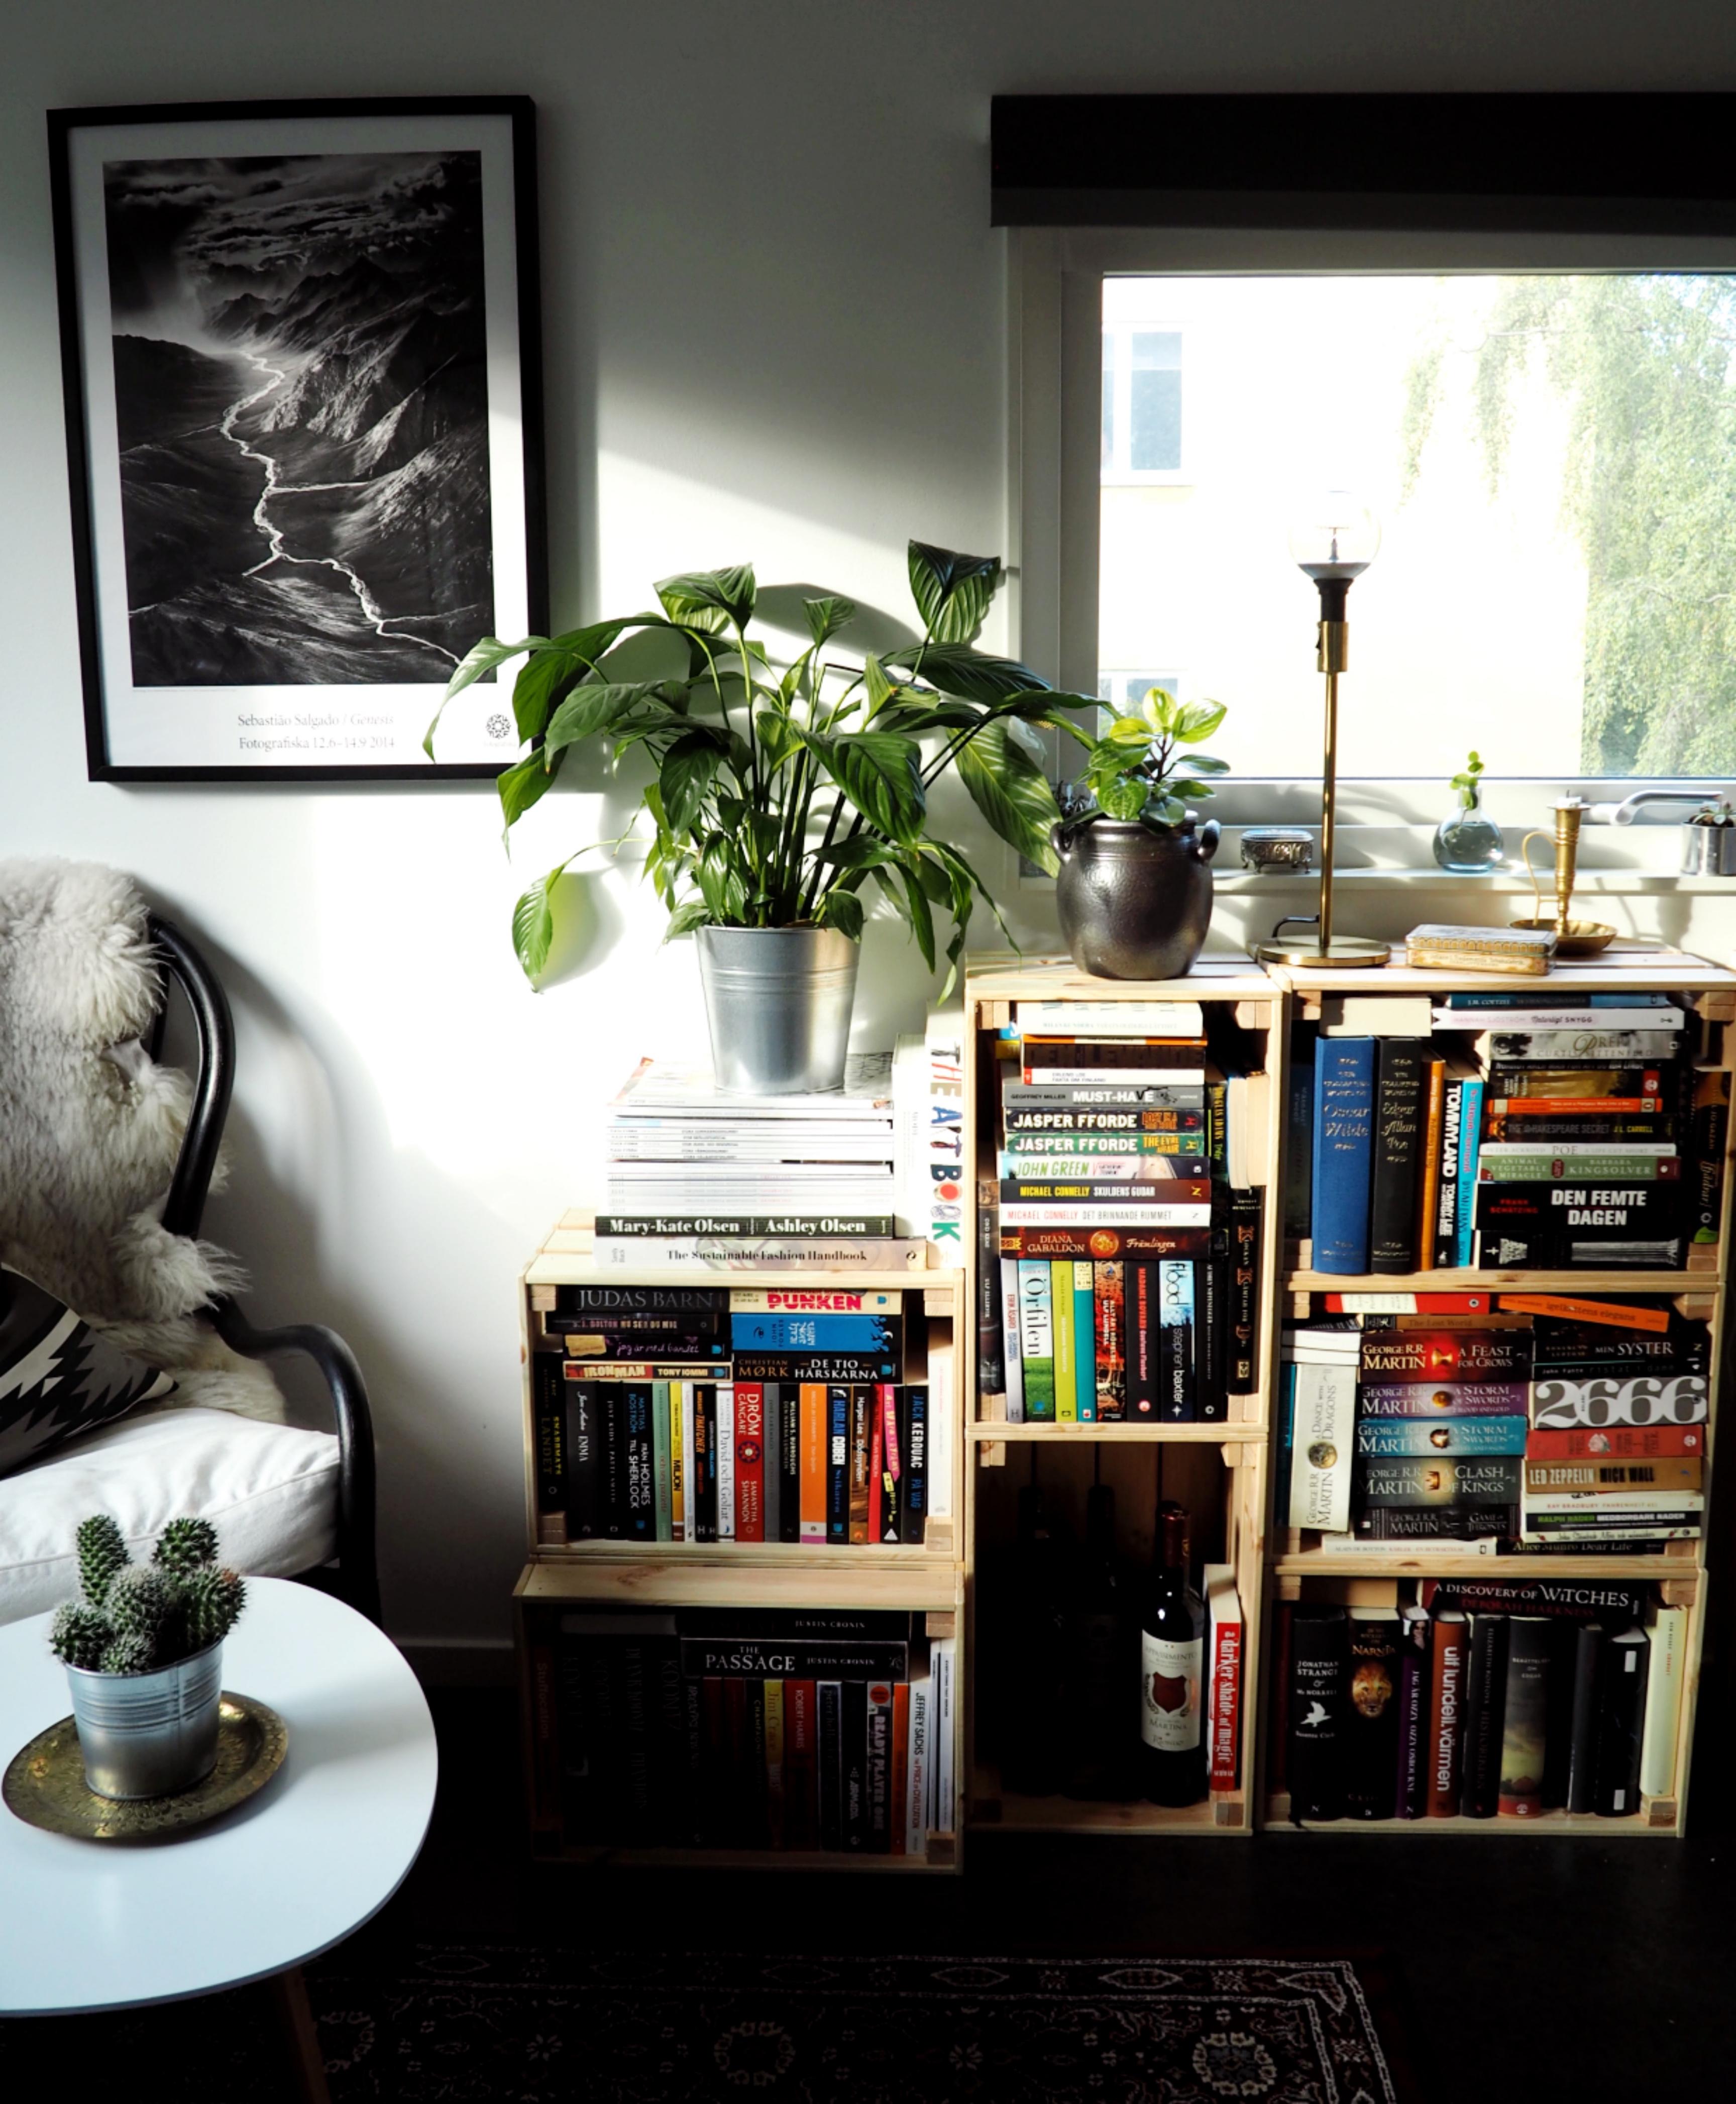 Tiny Living Hemma hos mig DIY bokhyllor EKOENKELT